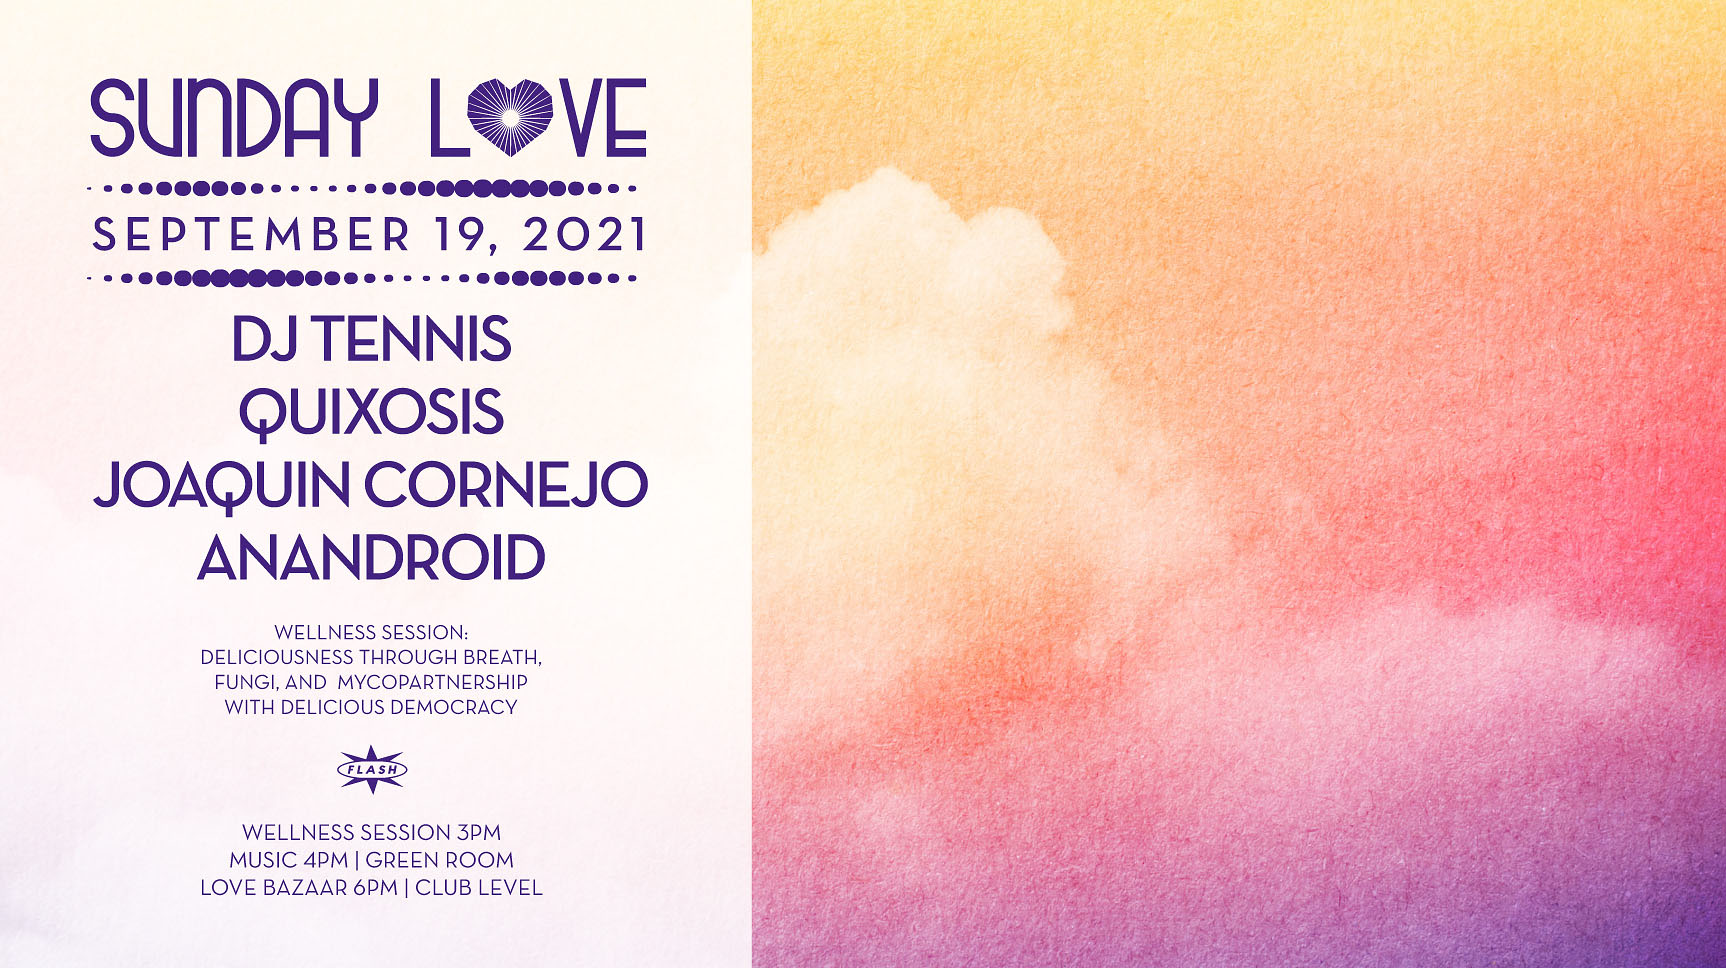 Sunday Love: DJ Tennis, Quixosis, Joaquin Cornejo, Anandroid